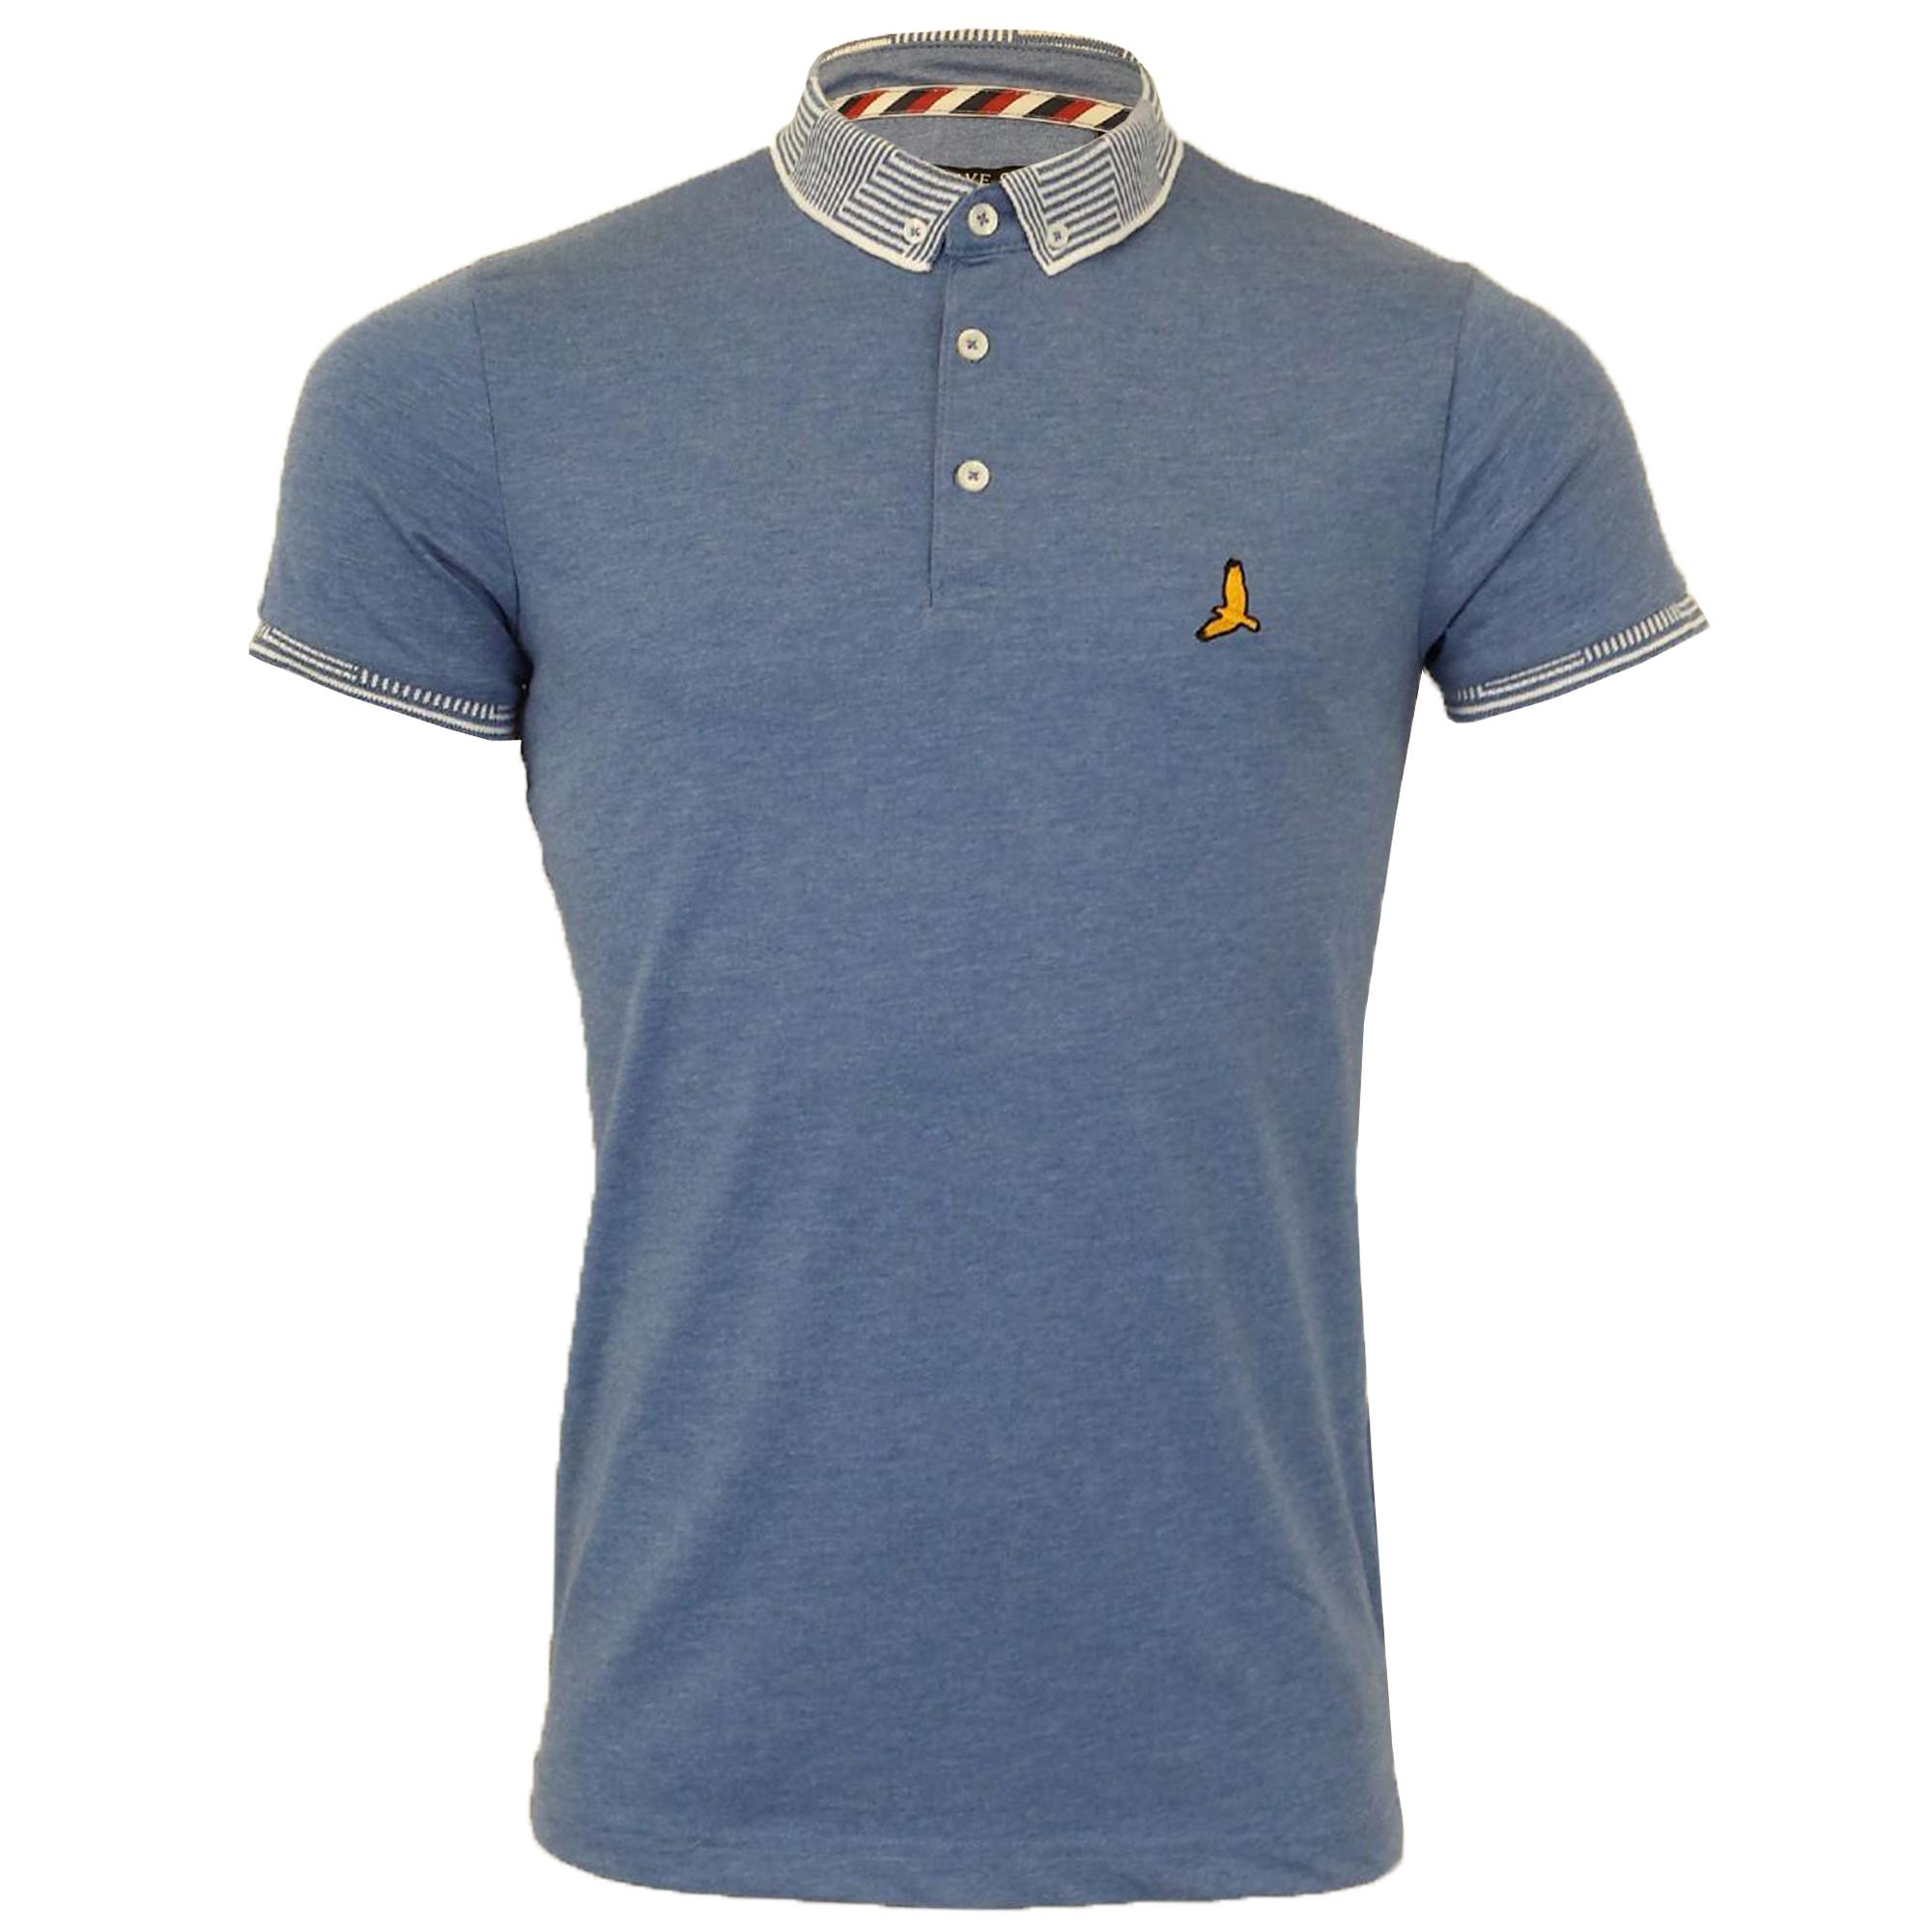 Mens-Polo-T-Shirt-Brave-Soul-Short-Sleeved-Cotton-GLOVER-Collared-KHALIFA-Summer thumbnail 14